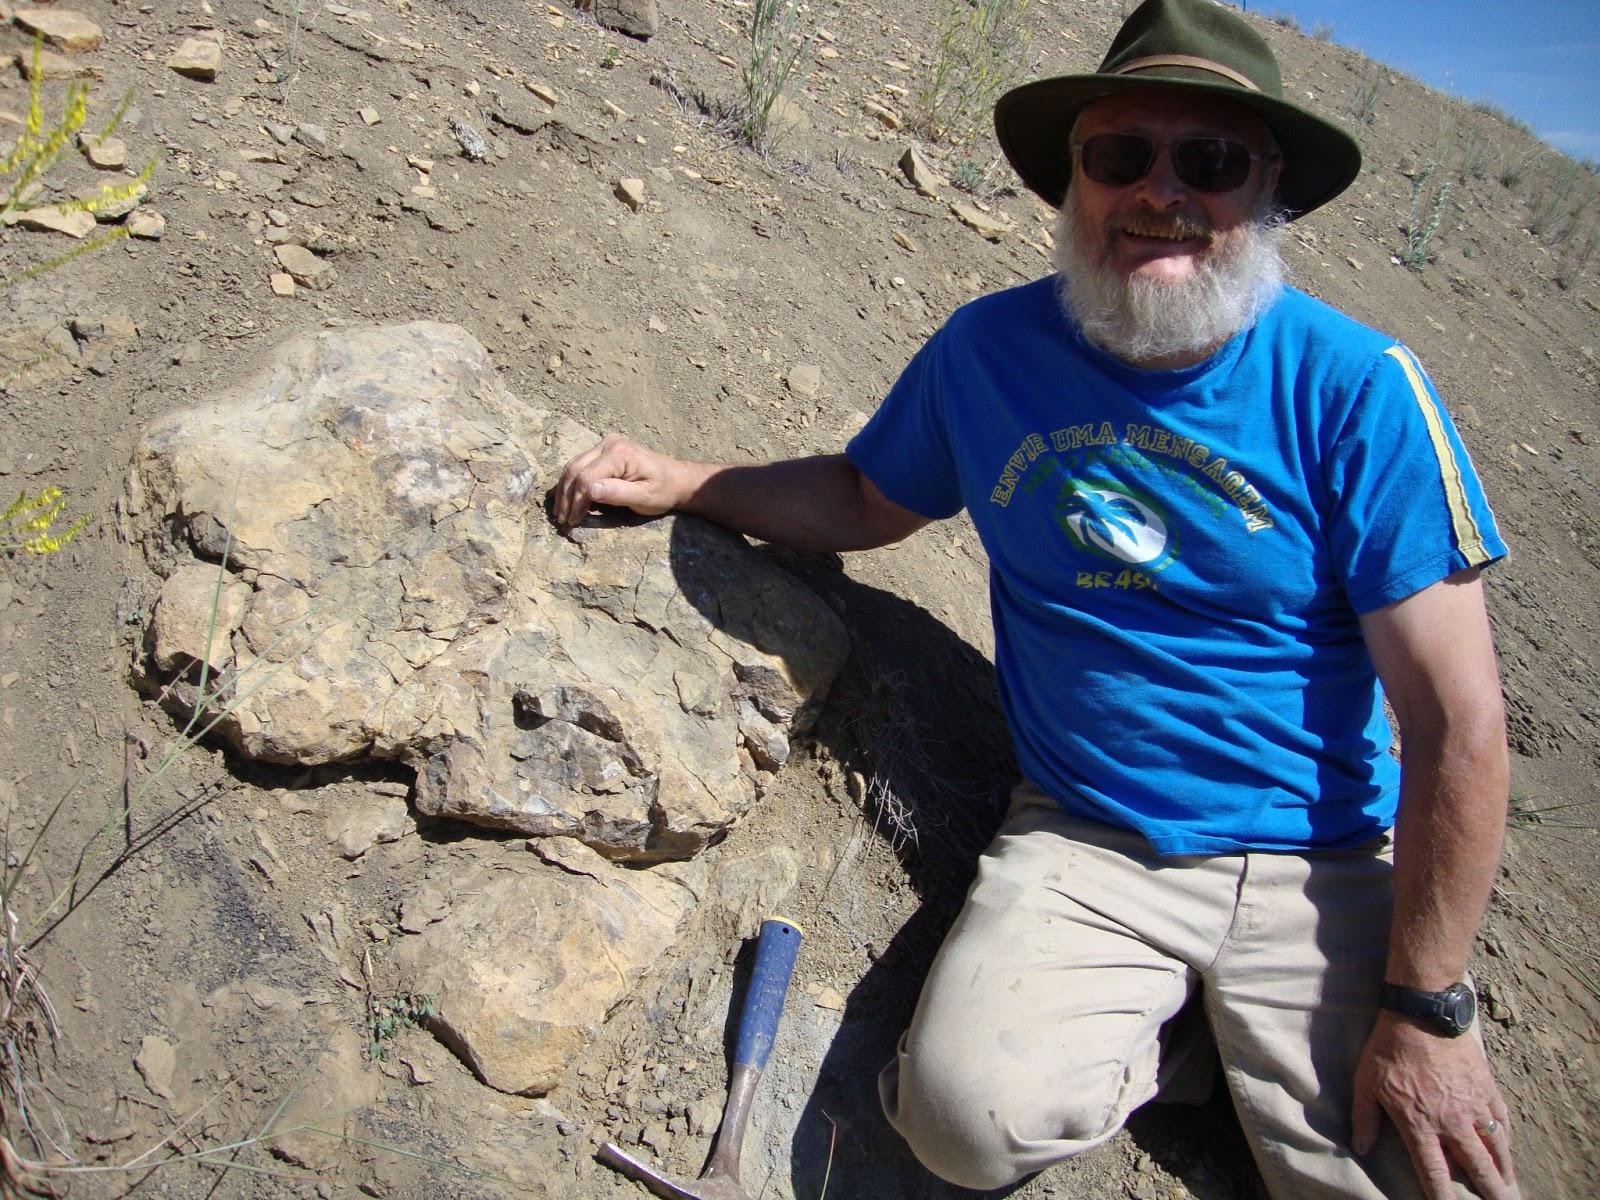 Greg Carr - discoverer of Bernie the Thalattosaur